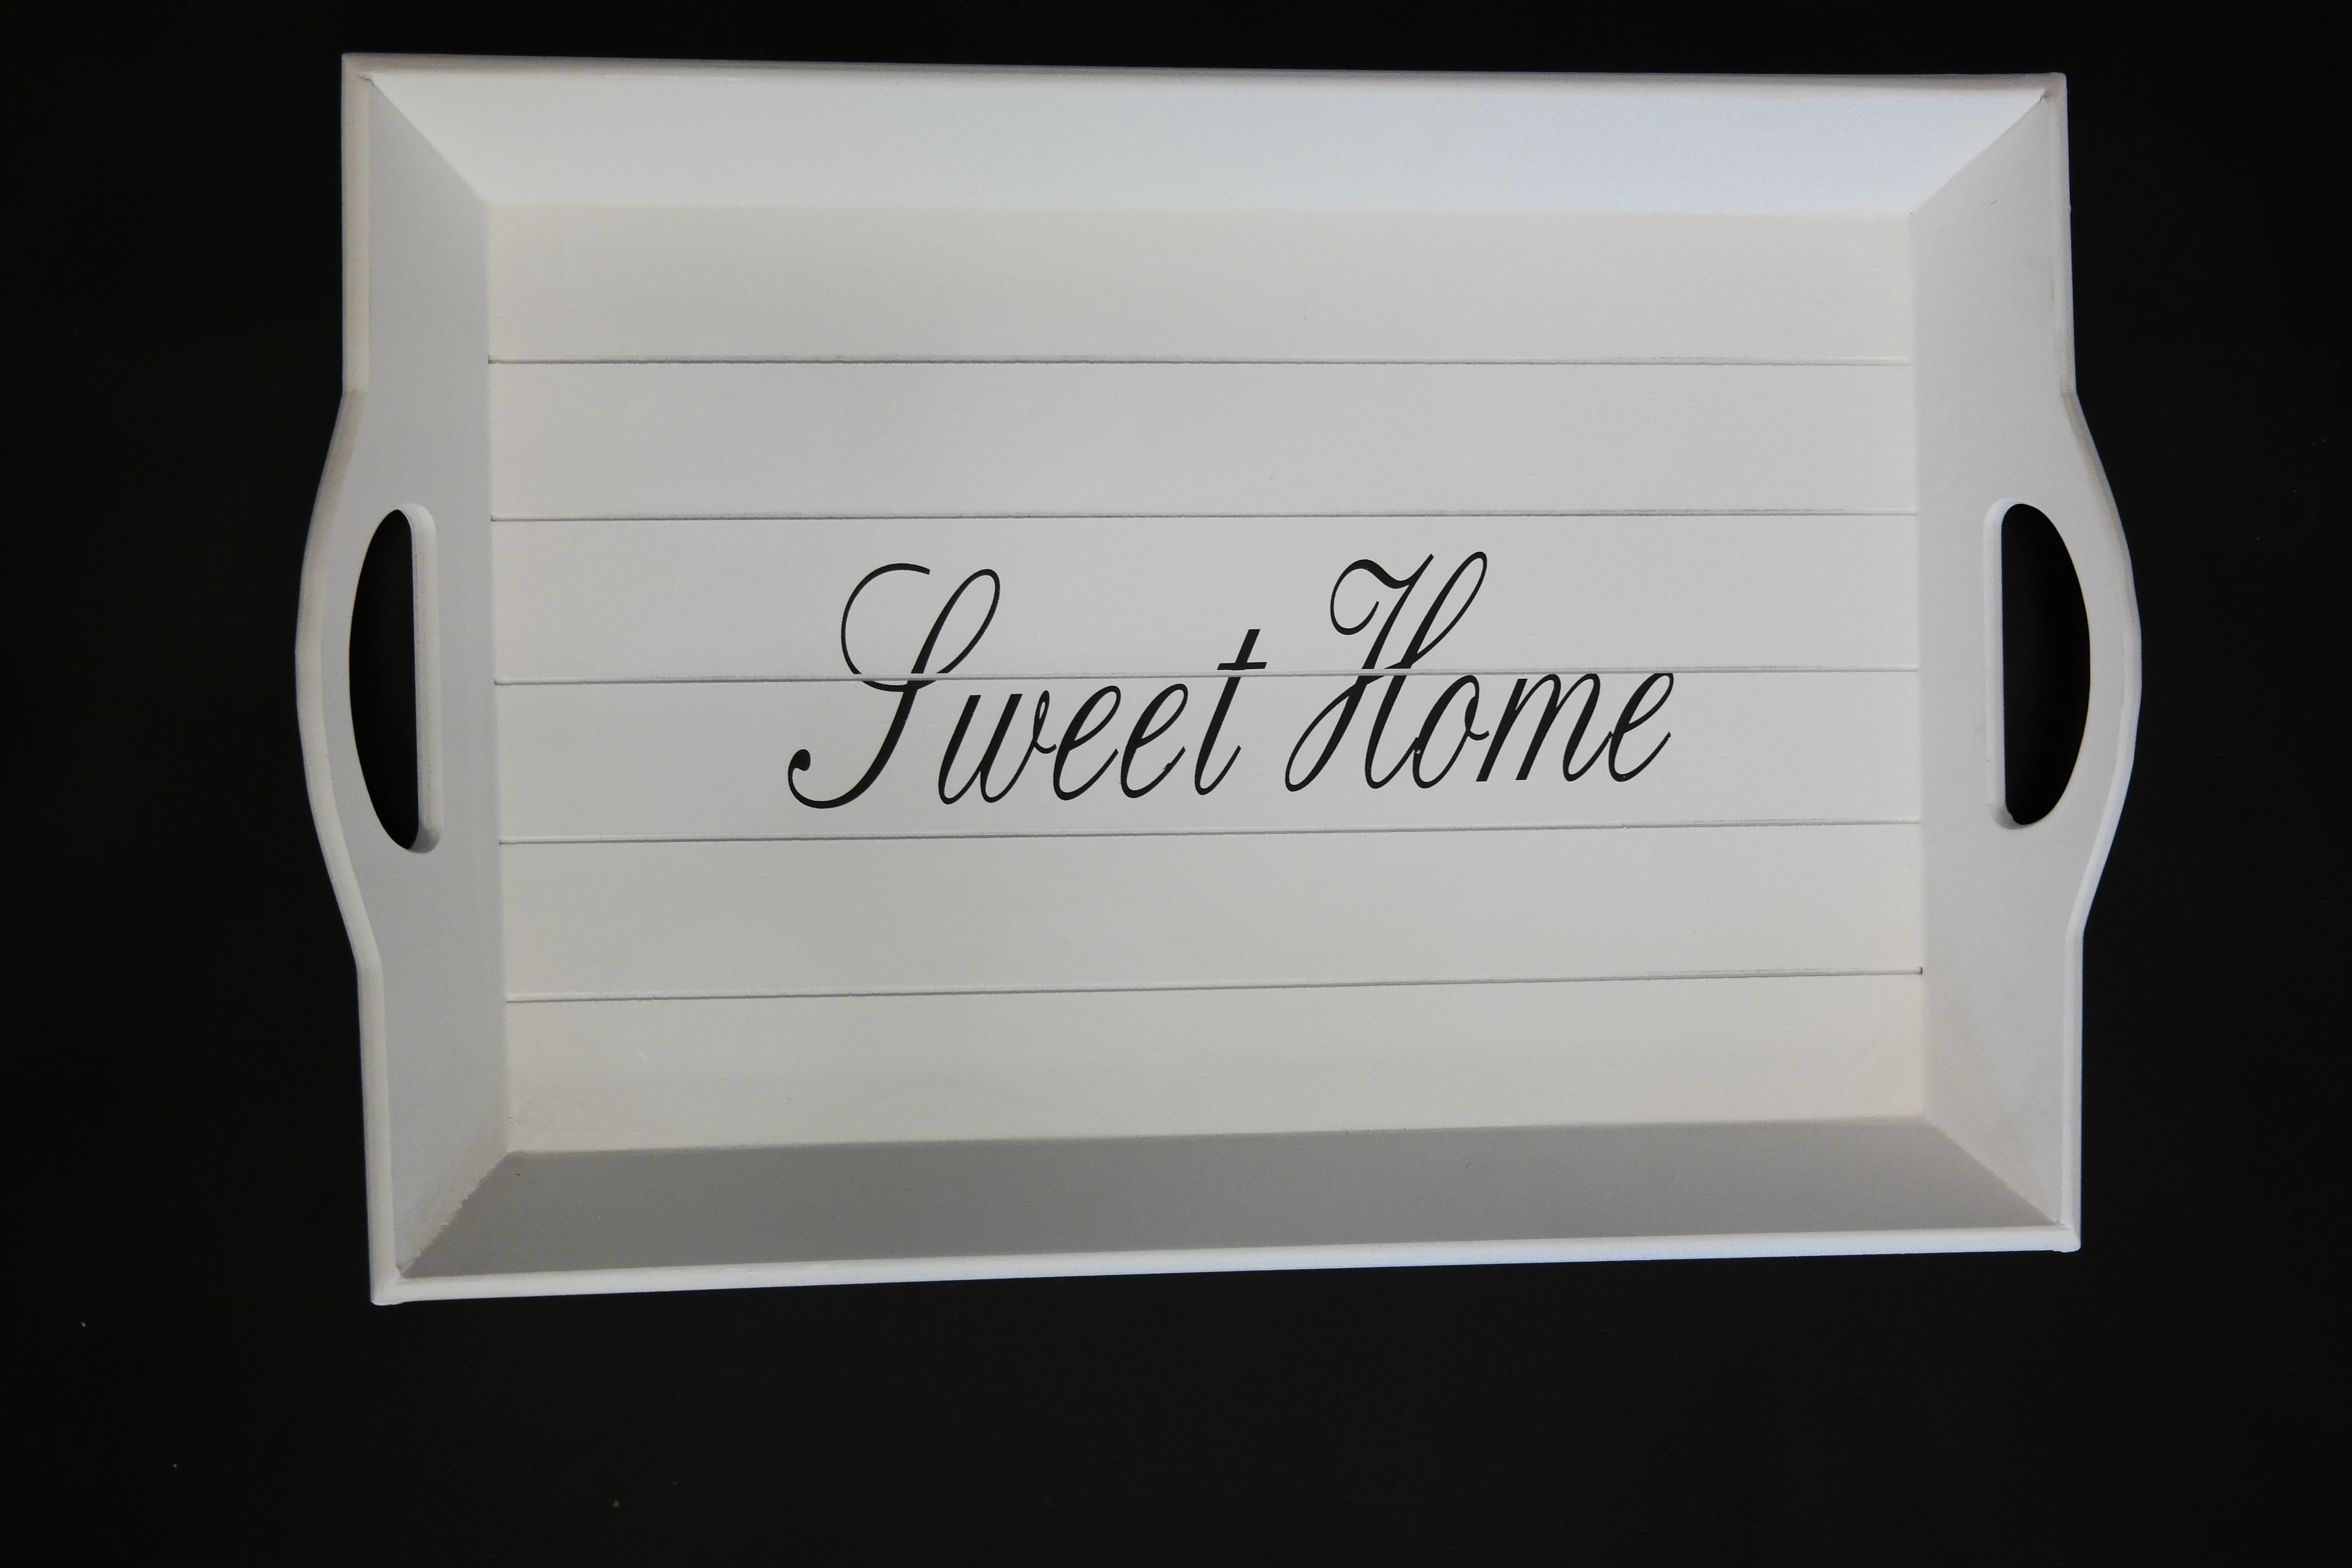 home affaire tablett sweet home wei online kaufen bei woonio. Black Bedroom Furniture Sets. Home Design Ideas